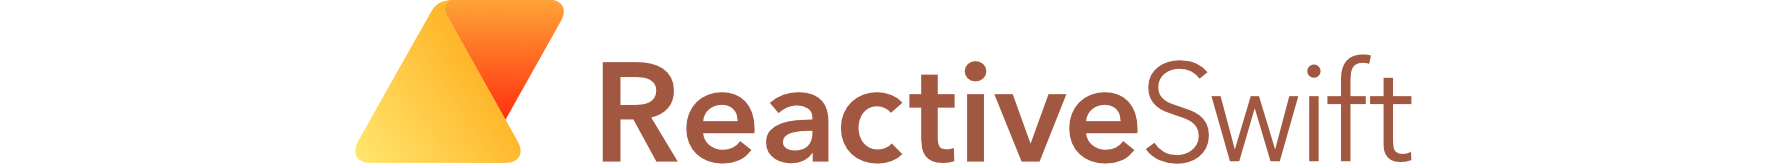 ReactiveSwift